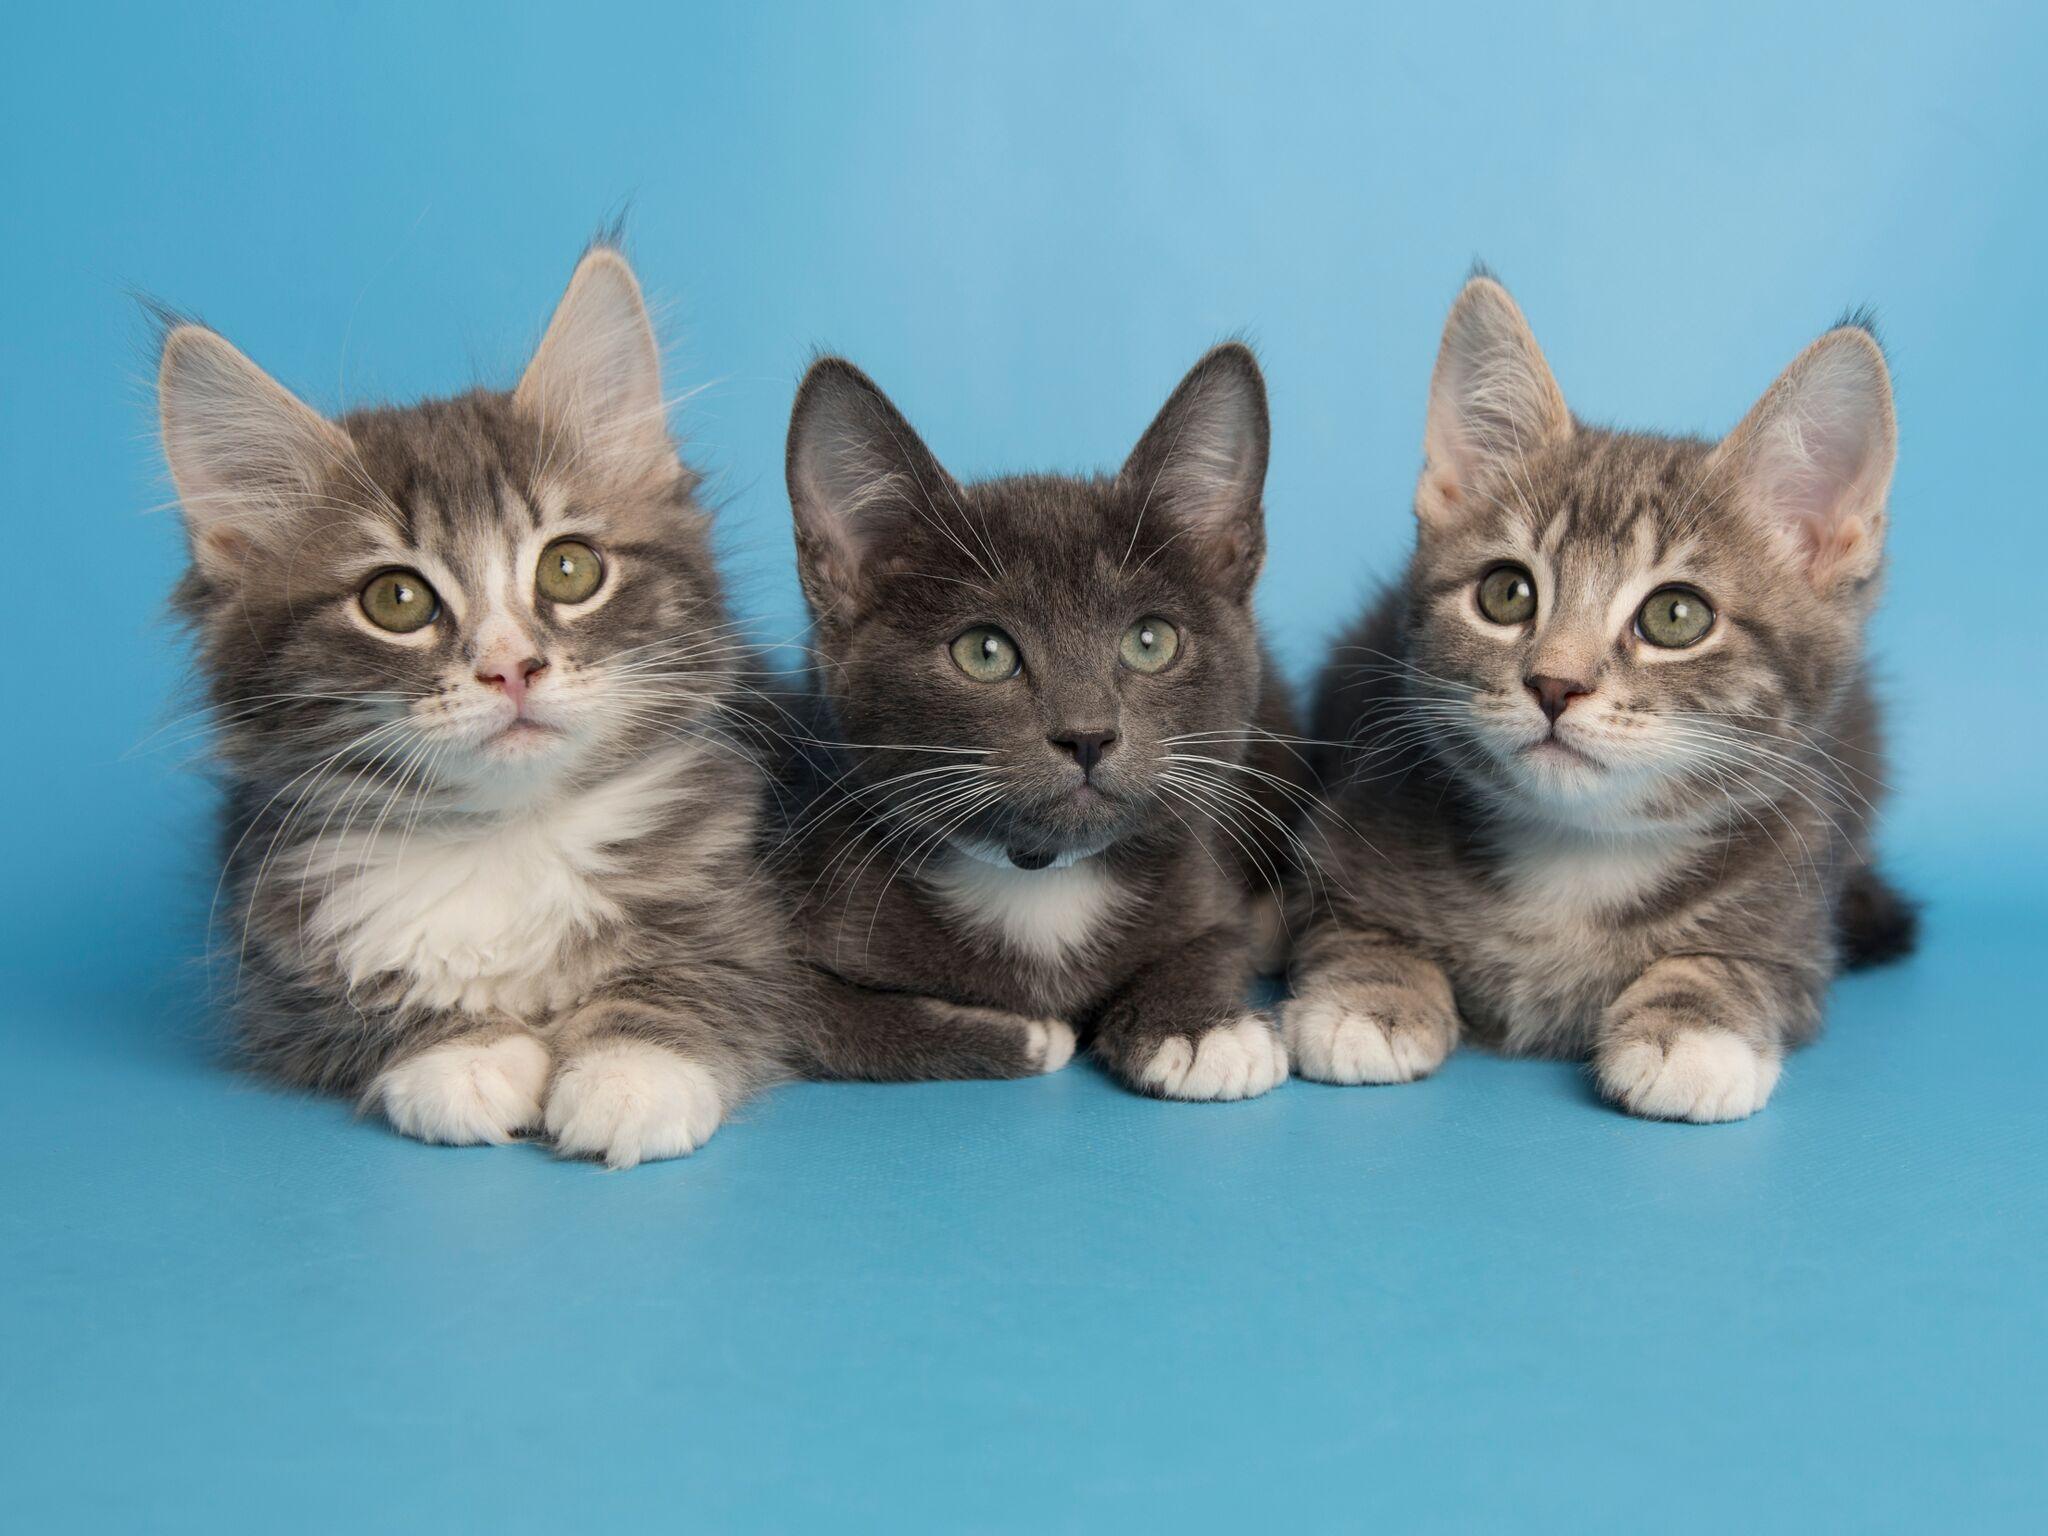 Kittens_preview.jpeg